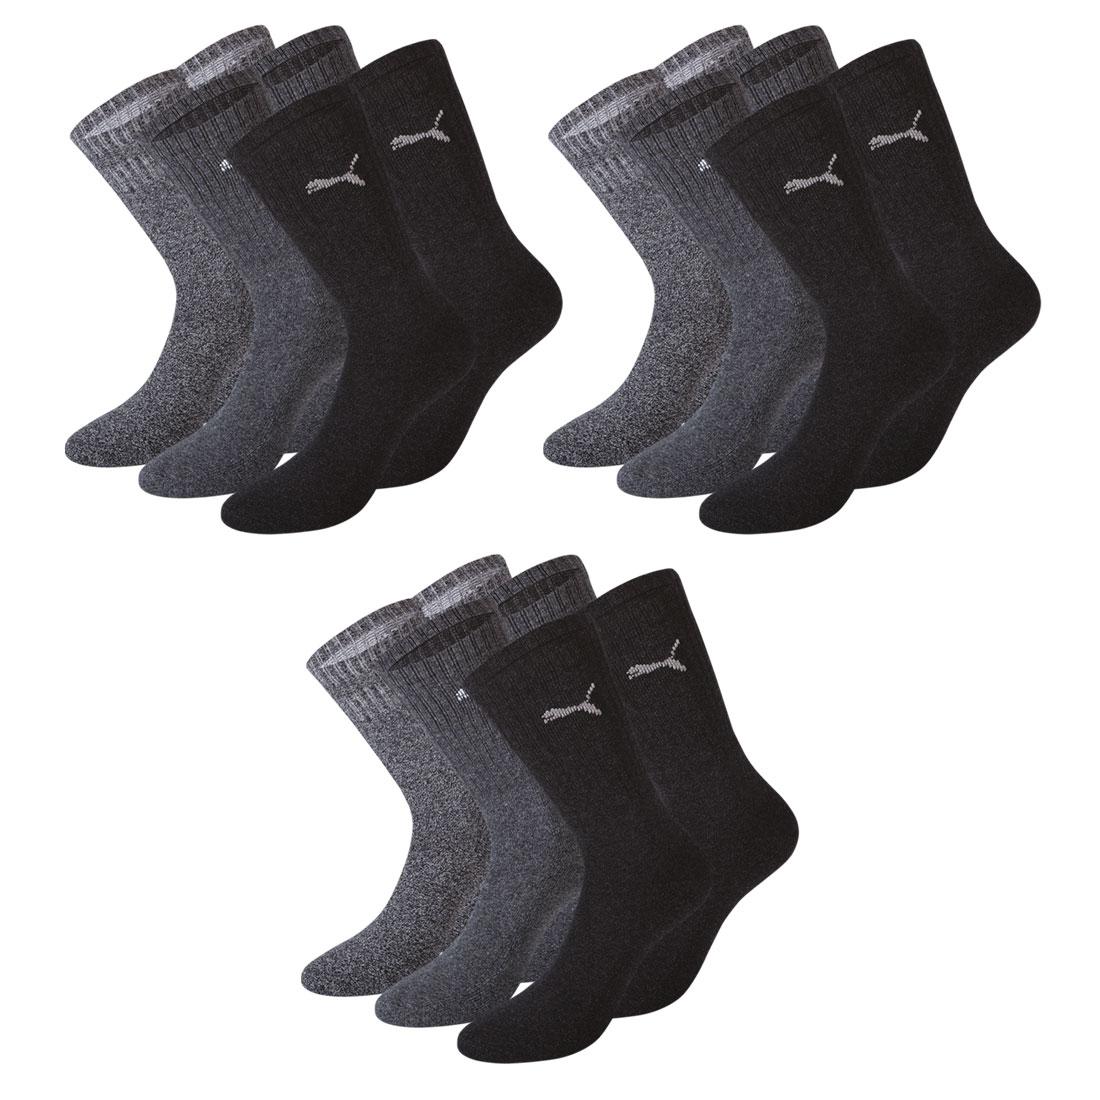 9 Paar Puma Socken, anthrazit / grau